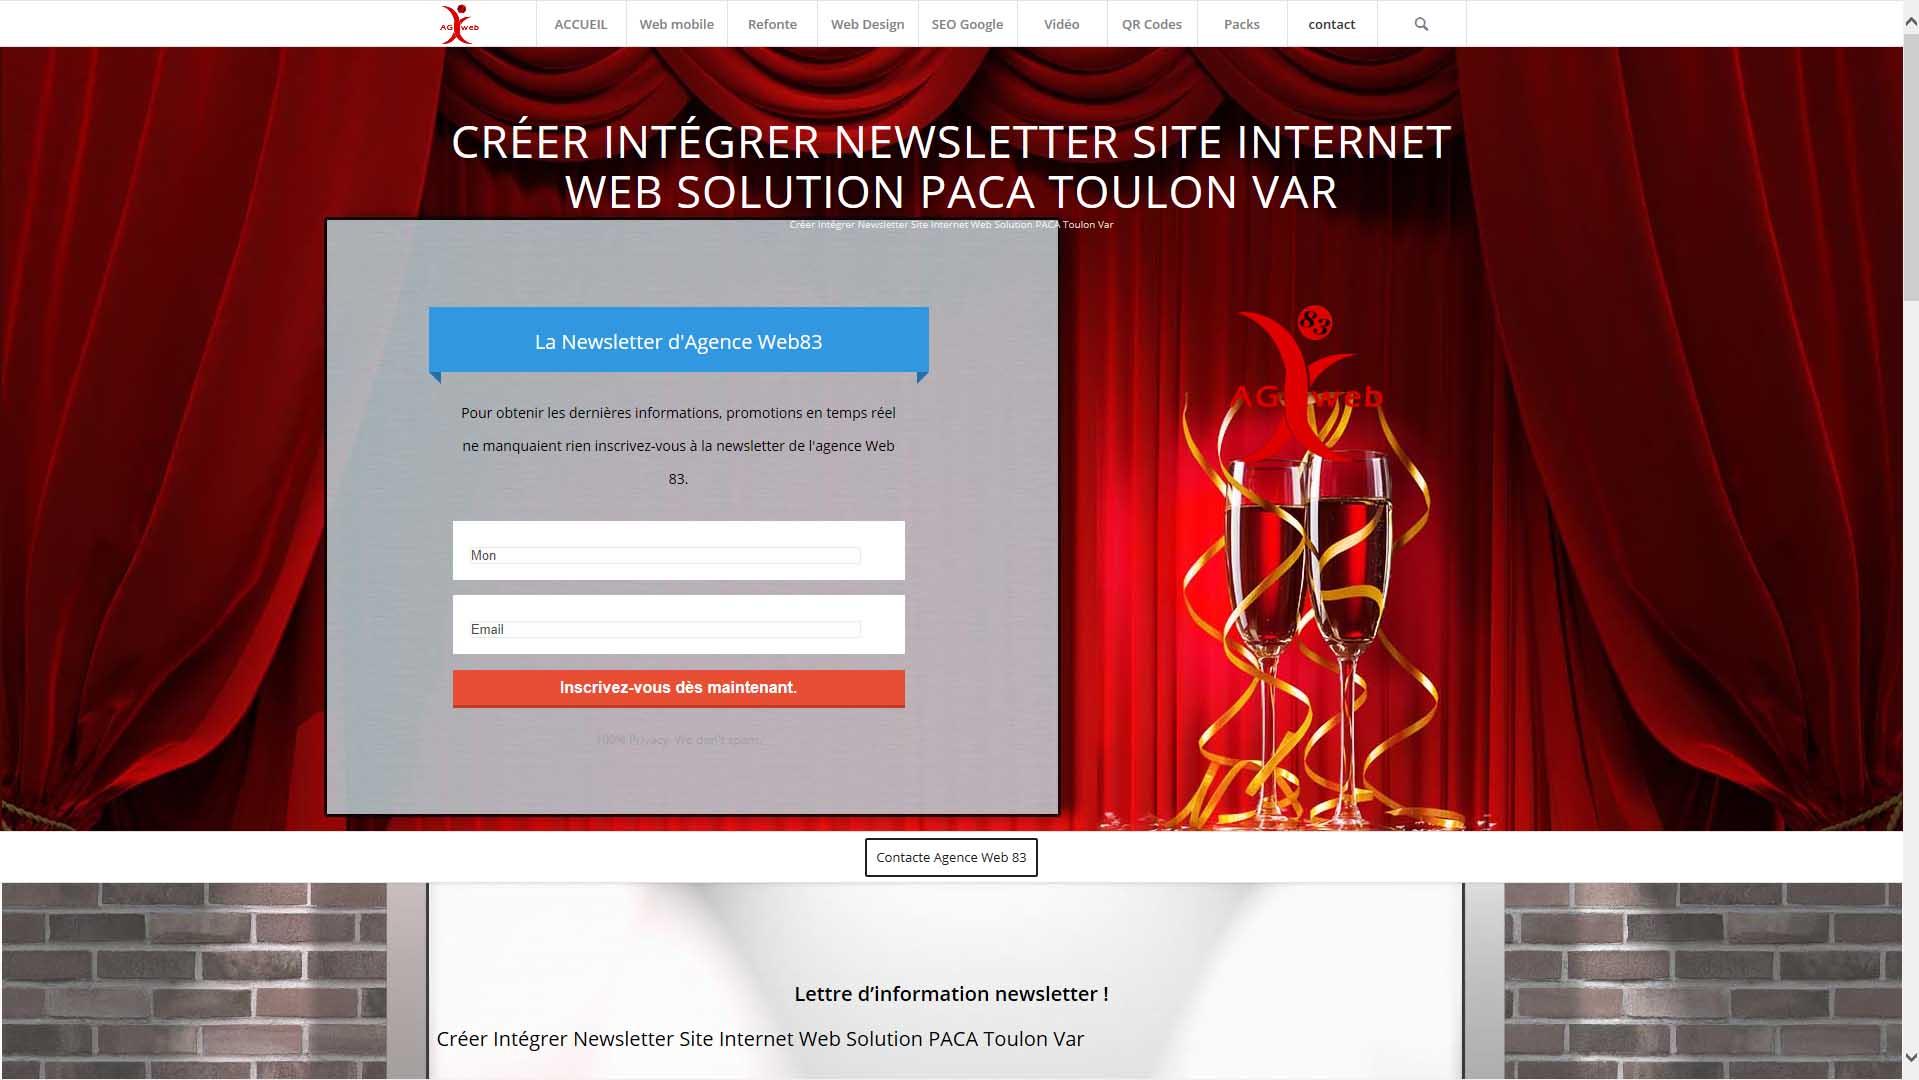 Créer Intégrer Newsletter Site Internet Web Solution PACA Toulon Var